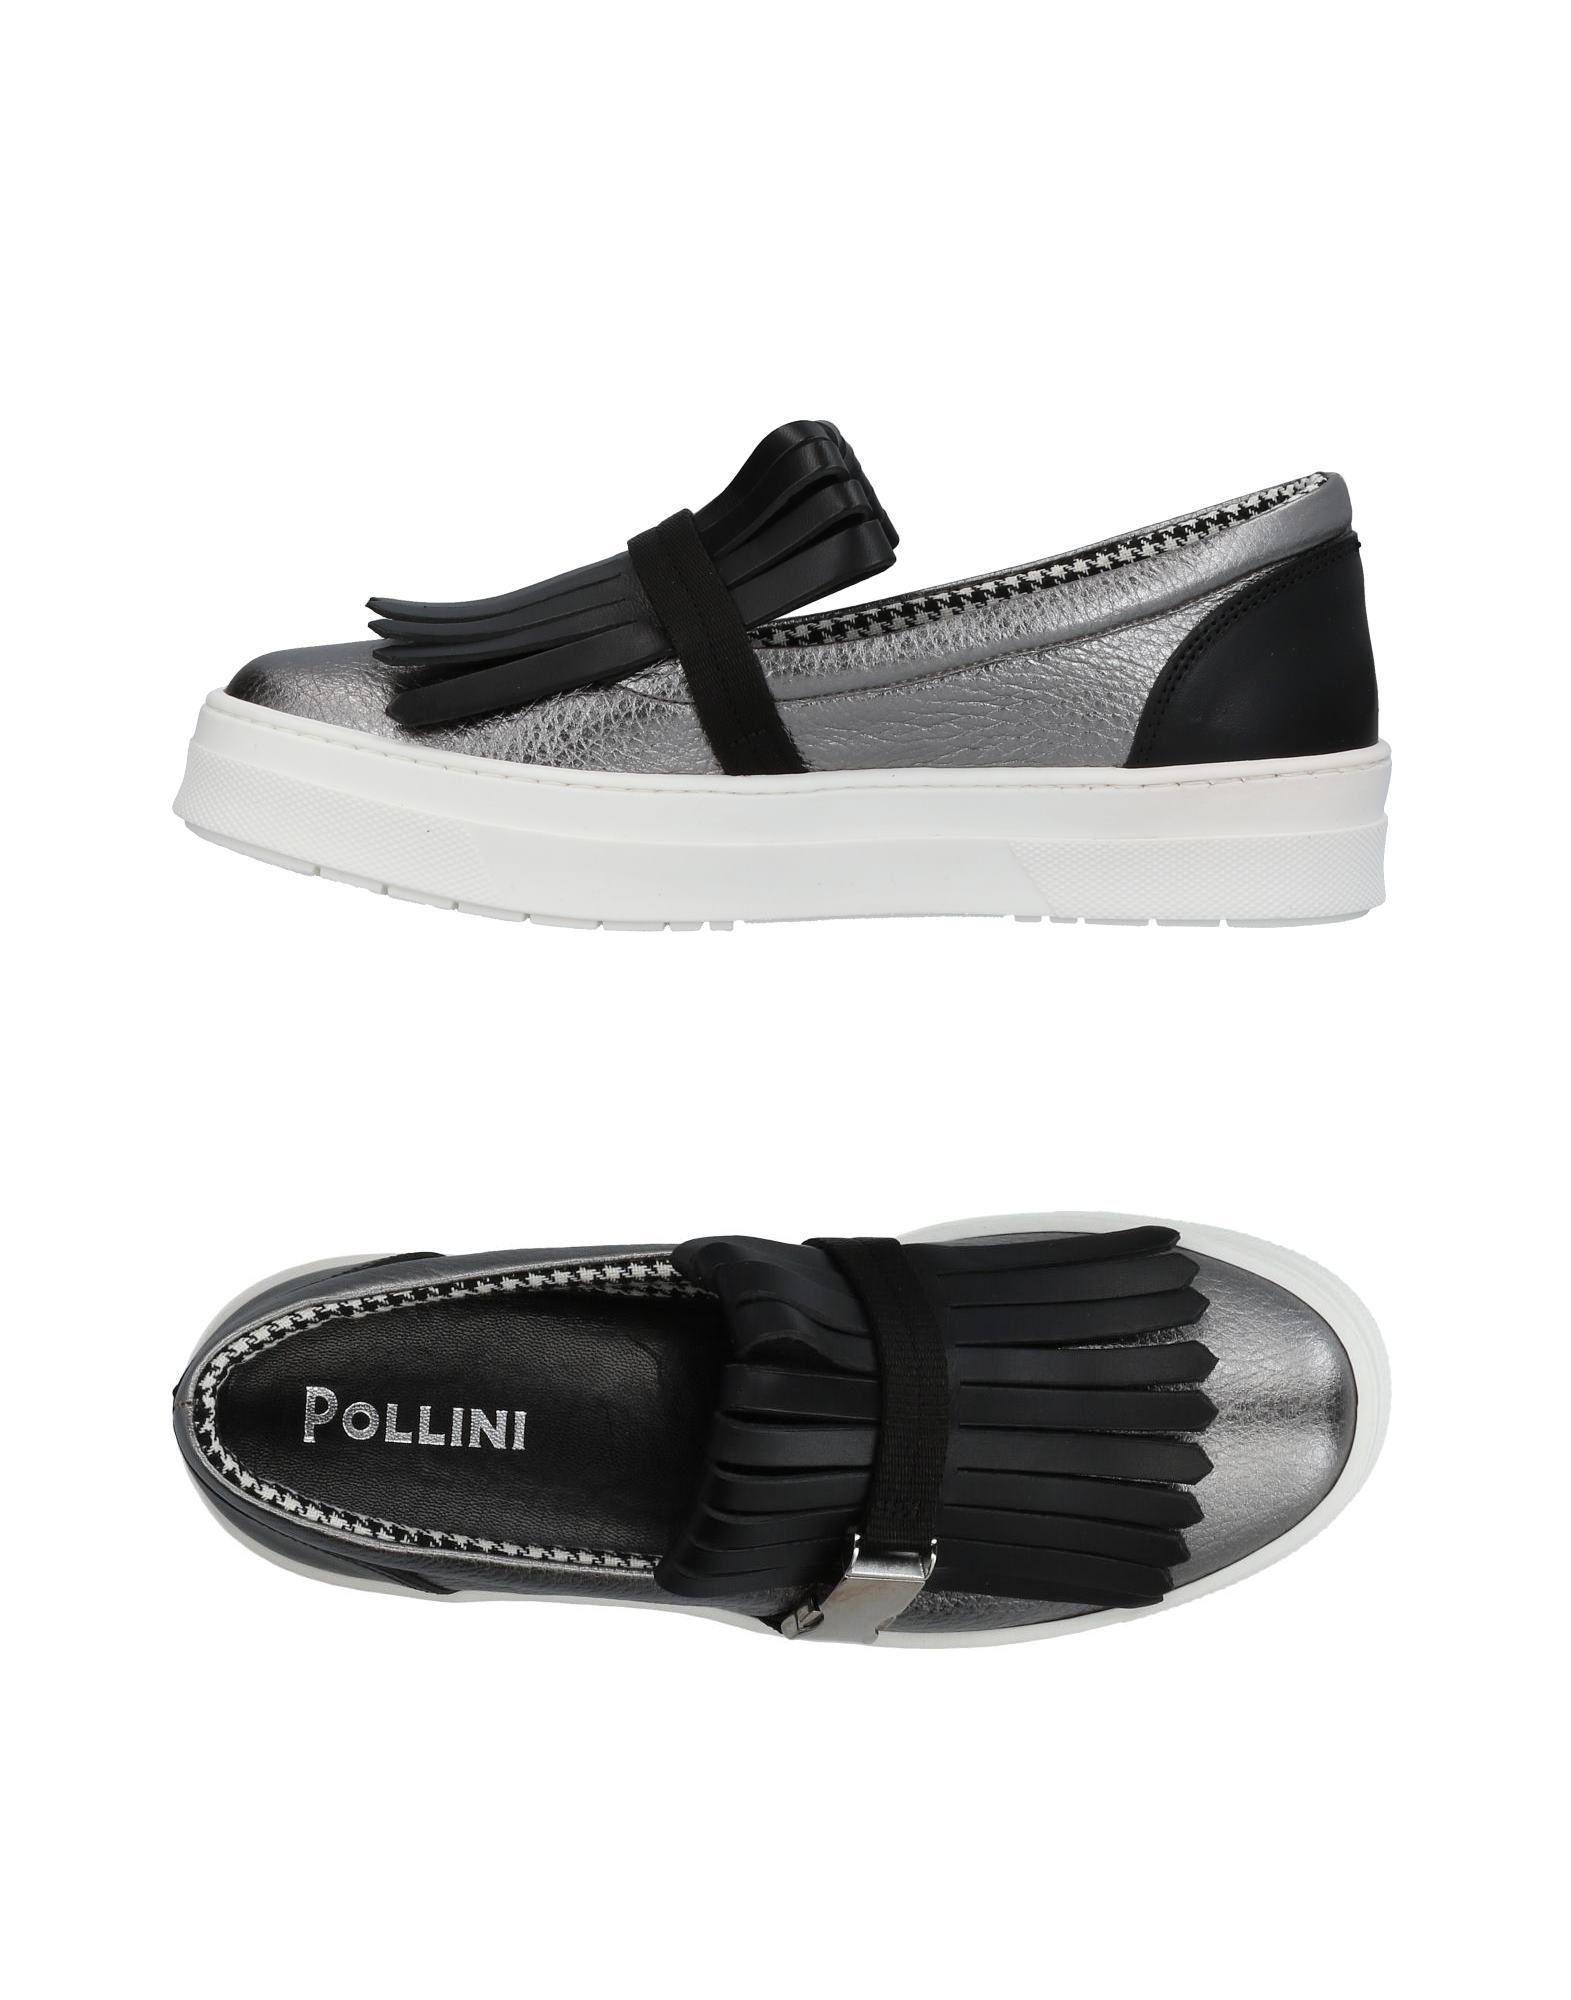 Pollini Sneakers In Silver